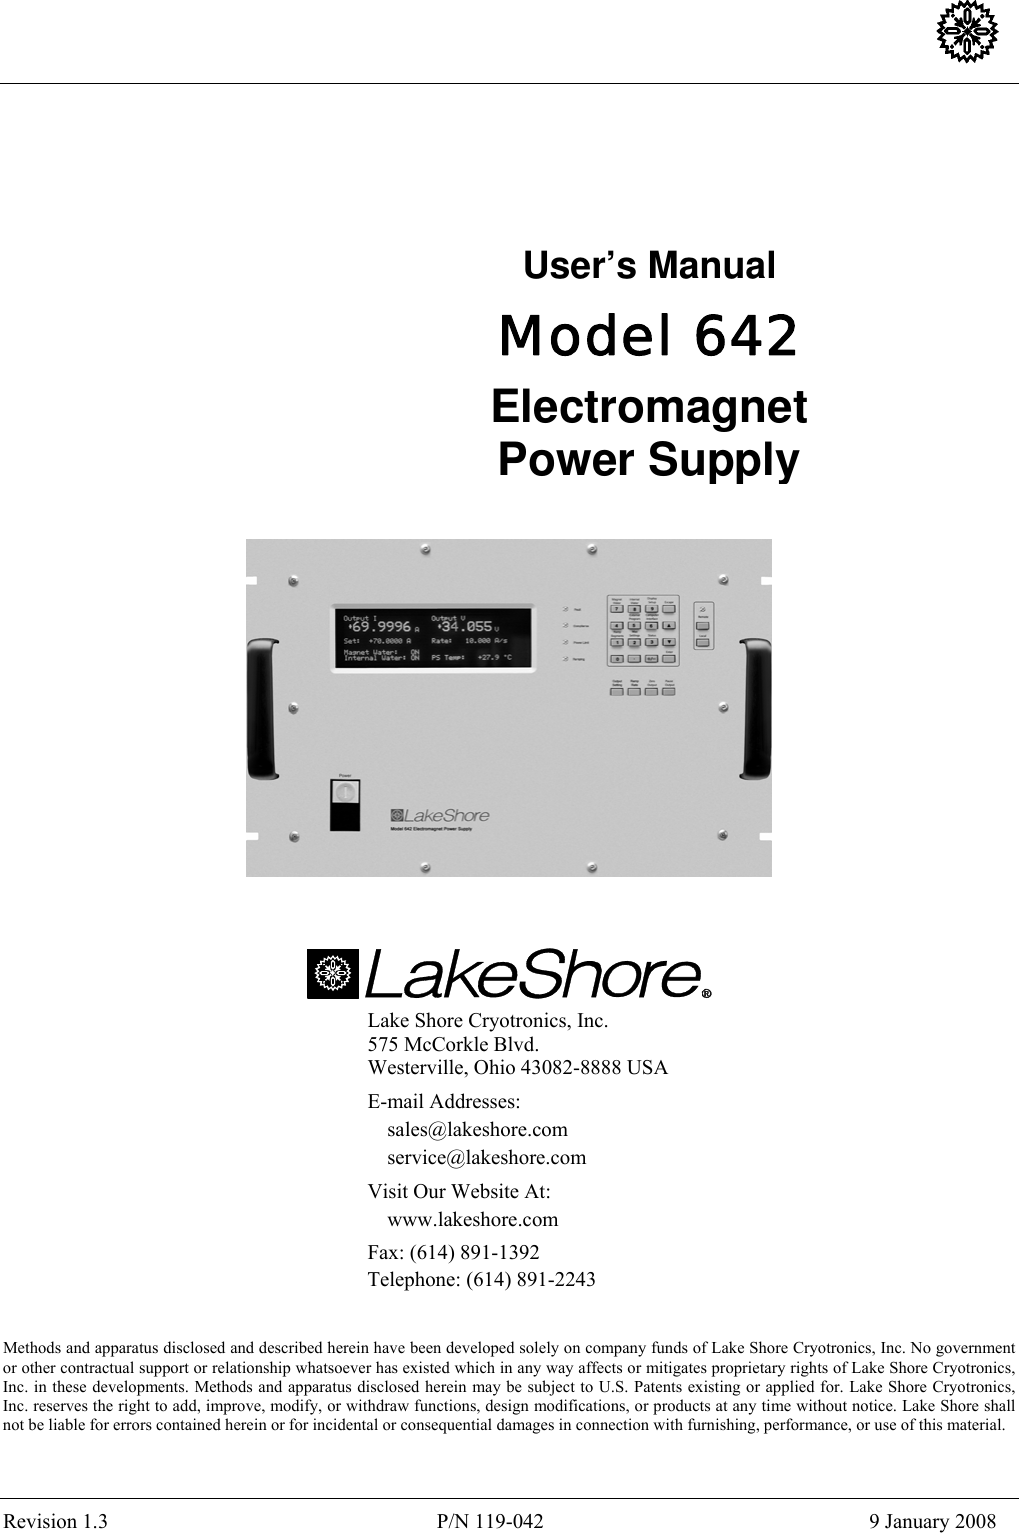 Lakeshore Learning Materials 642 Users Manual V13 Circuit Diagram Of Uniline Ups